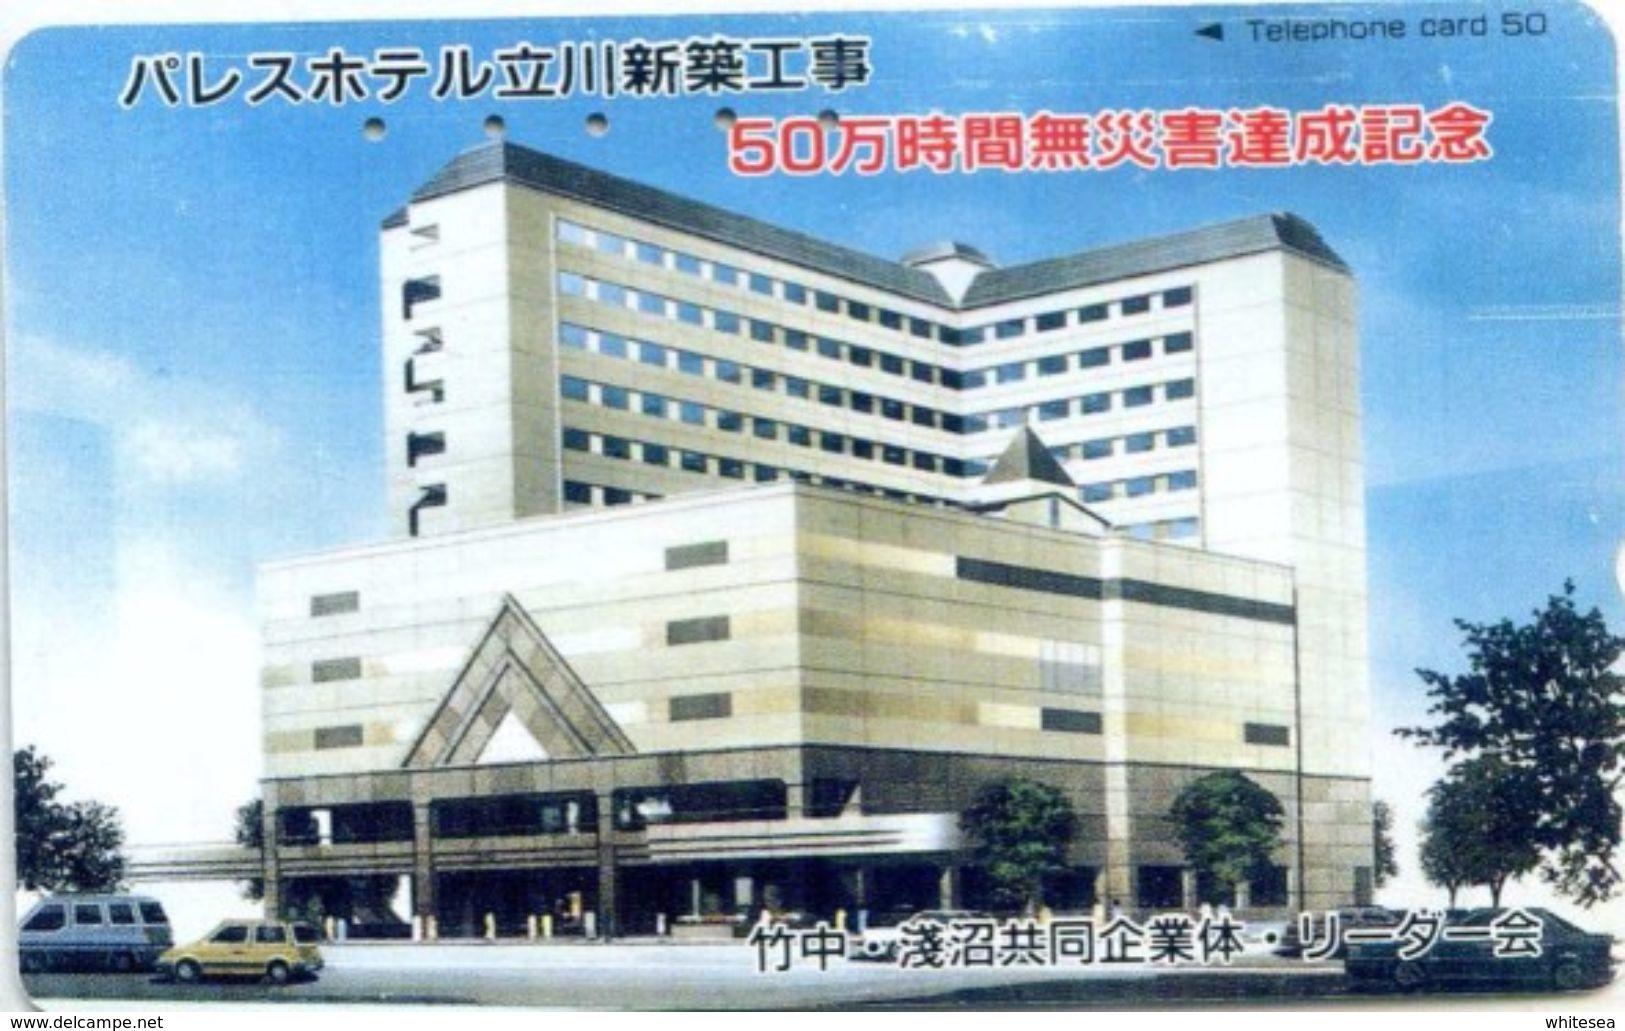 Telefonkarte Japan - Werbung - Gebäude - 110-155300 - Japan